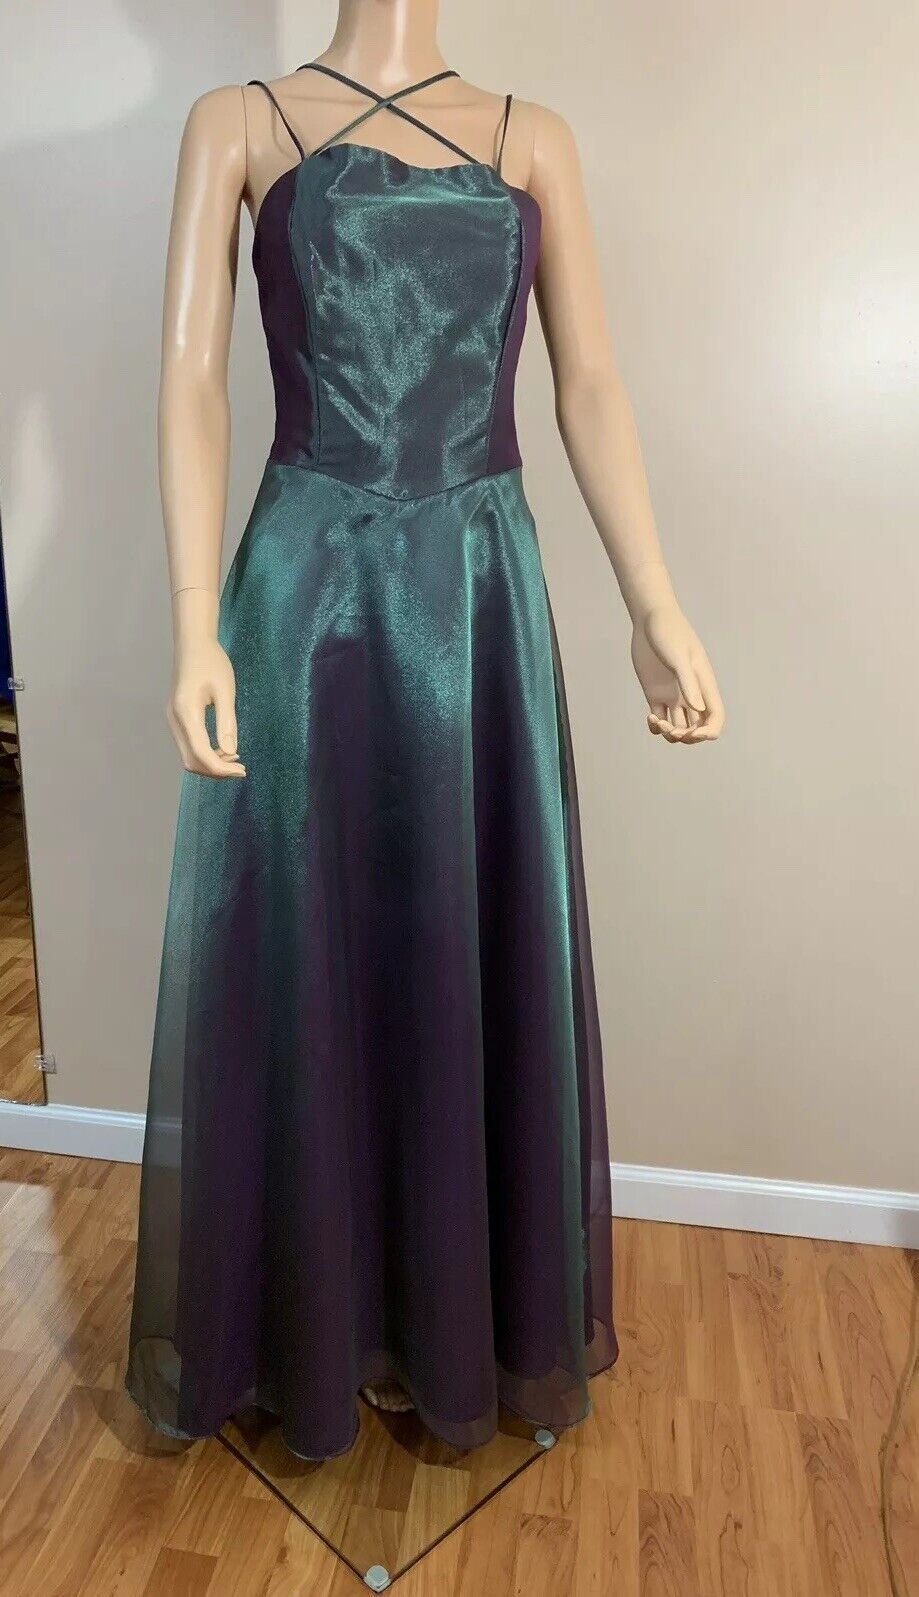 New NADINE Woman Long Dress KIWIBERRY Farbe Größe 7